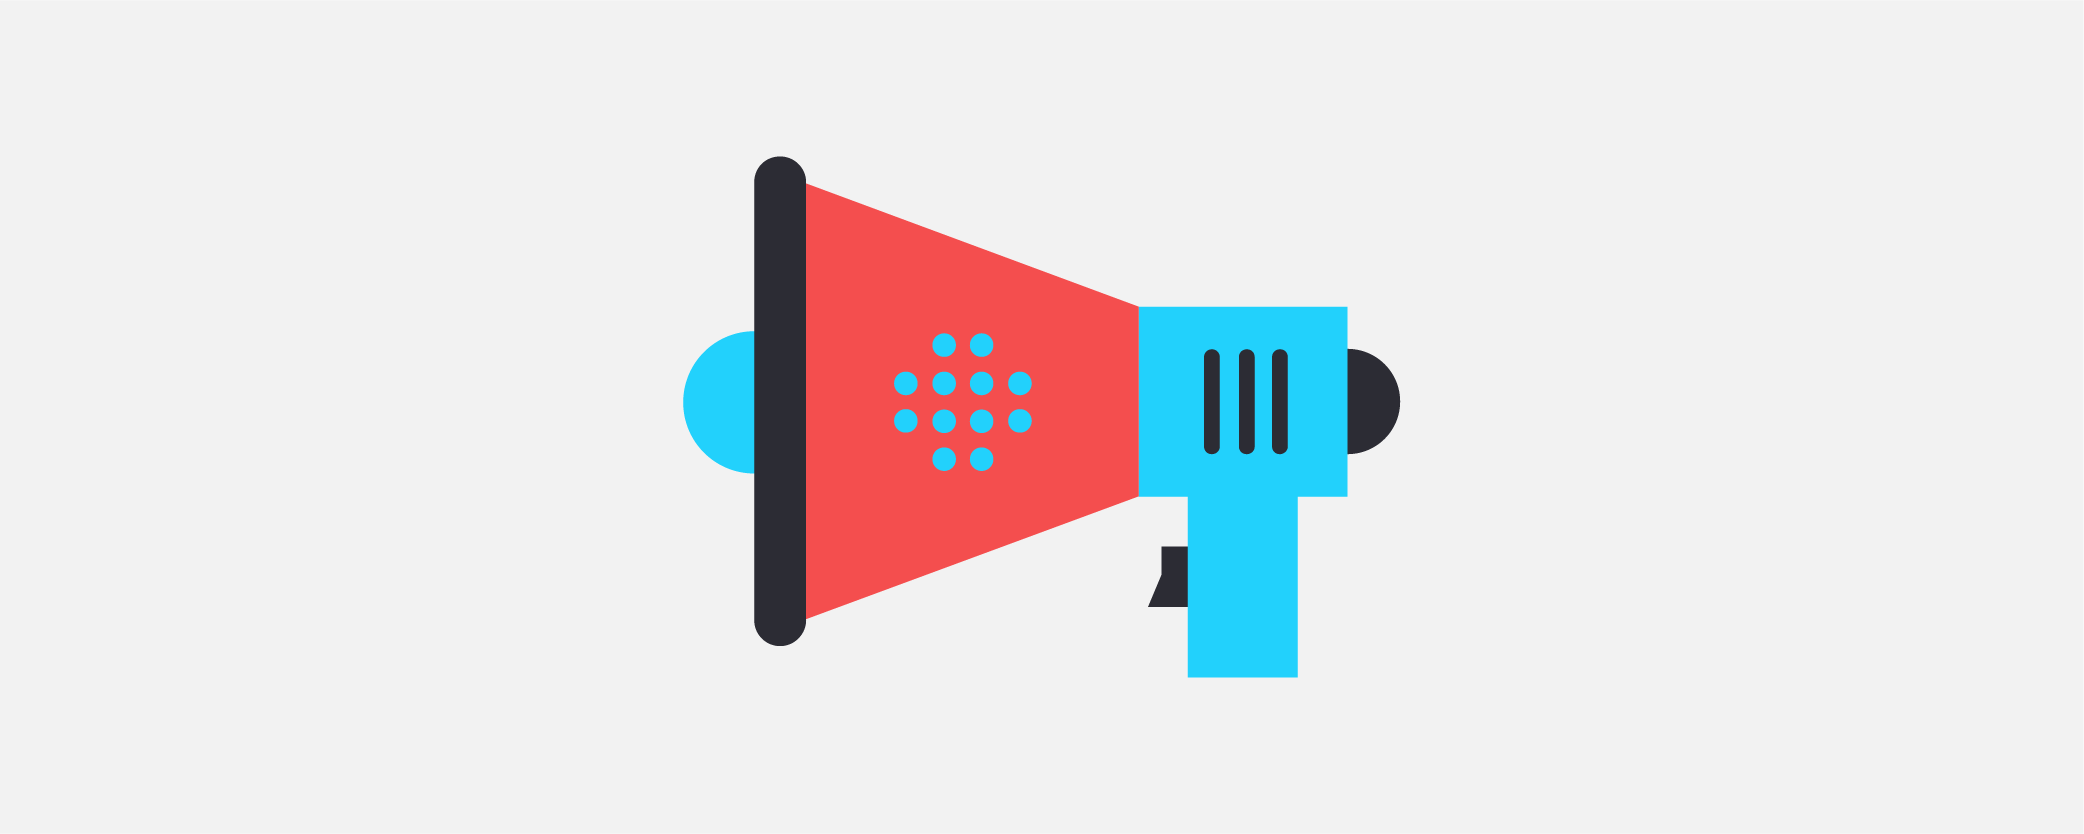 A graphic of a megaphone